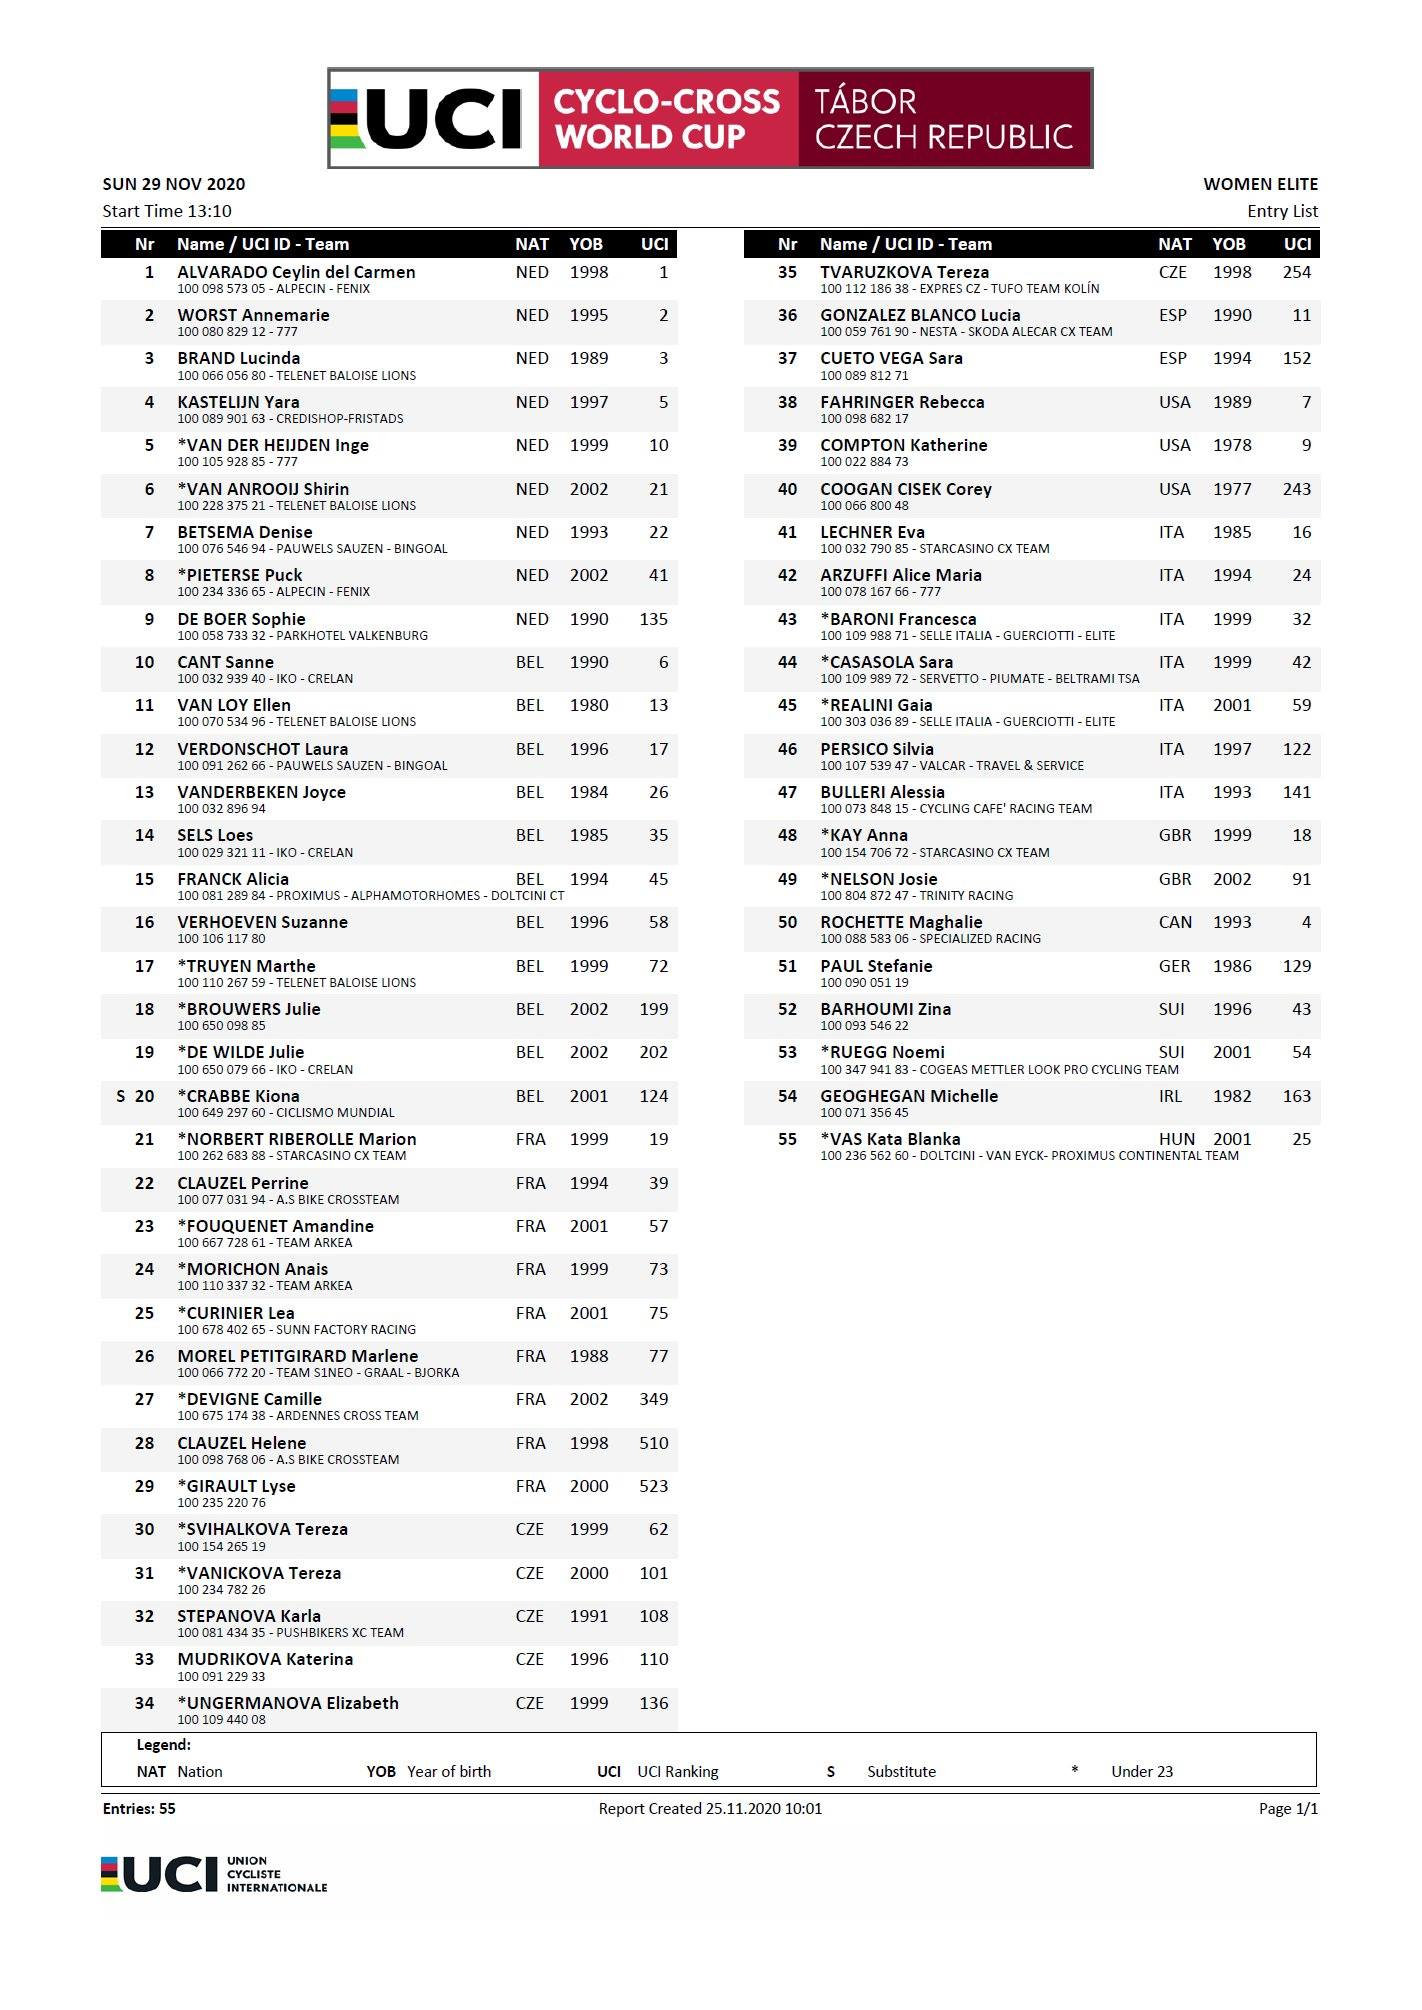 Cyclo-cross - Coupe du monde de Tabor  la startlist de la course femmes